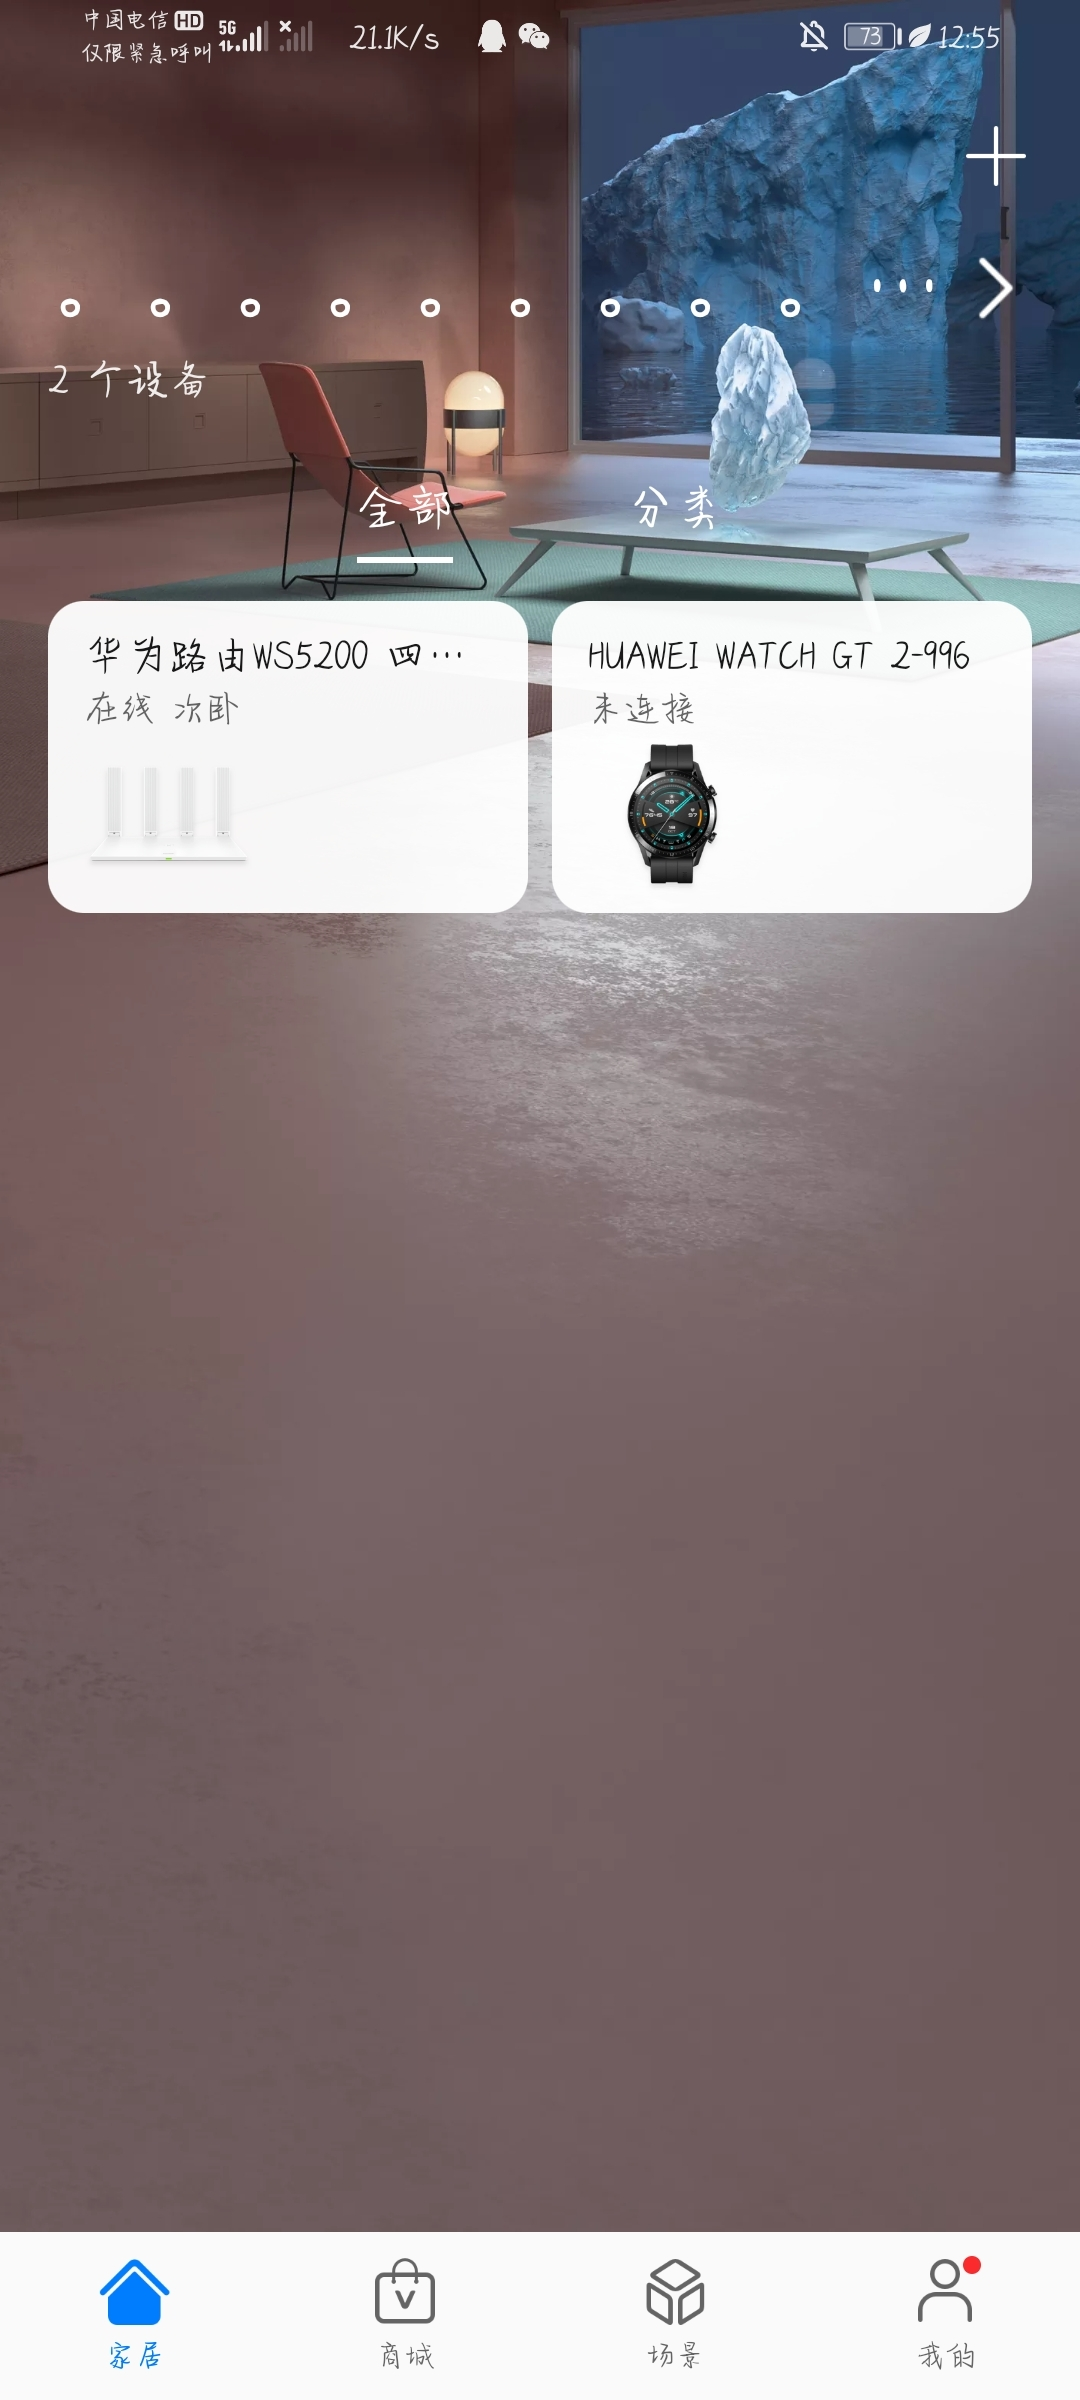 Screenshot_20210317_125536_com.huawei.smarthome.jpg